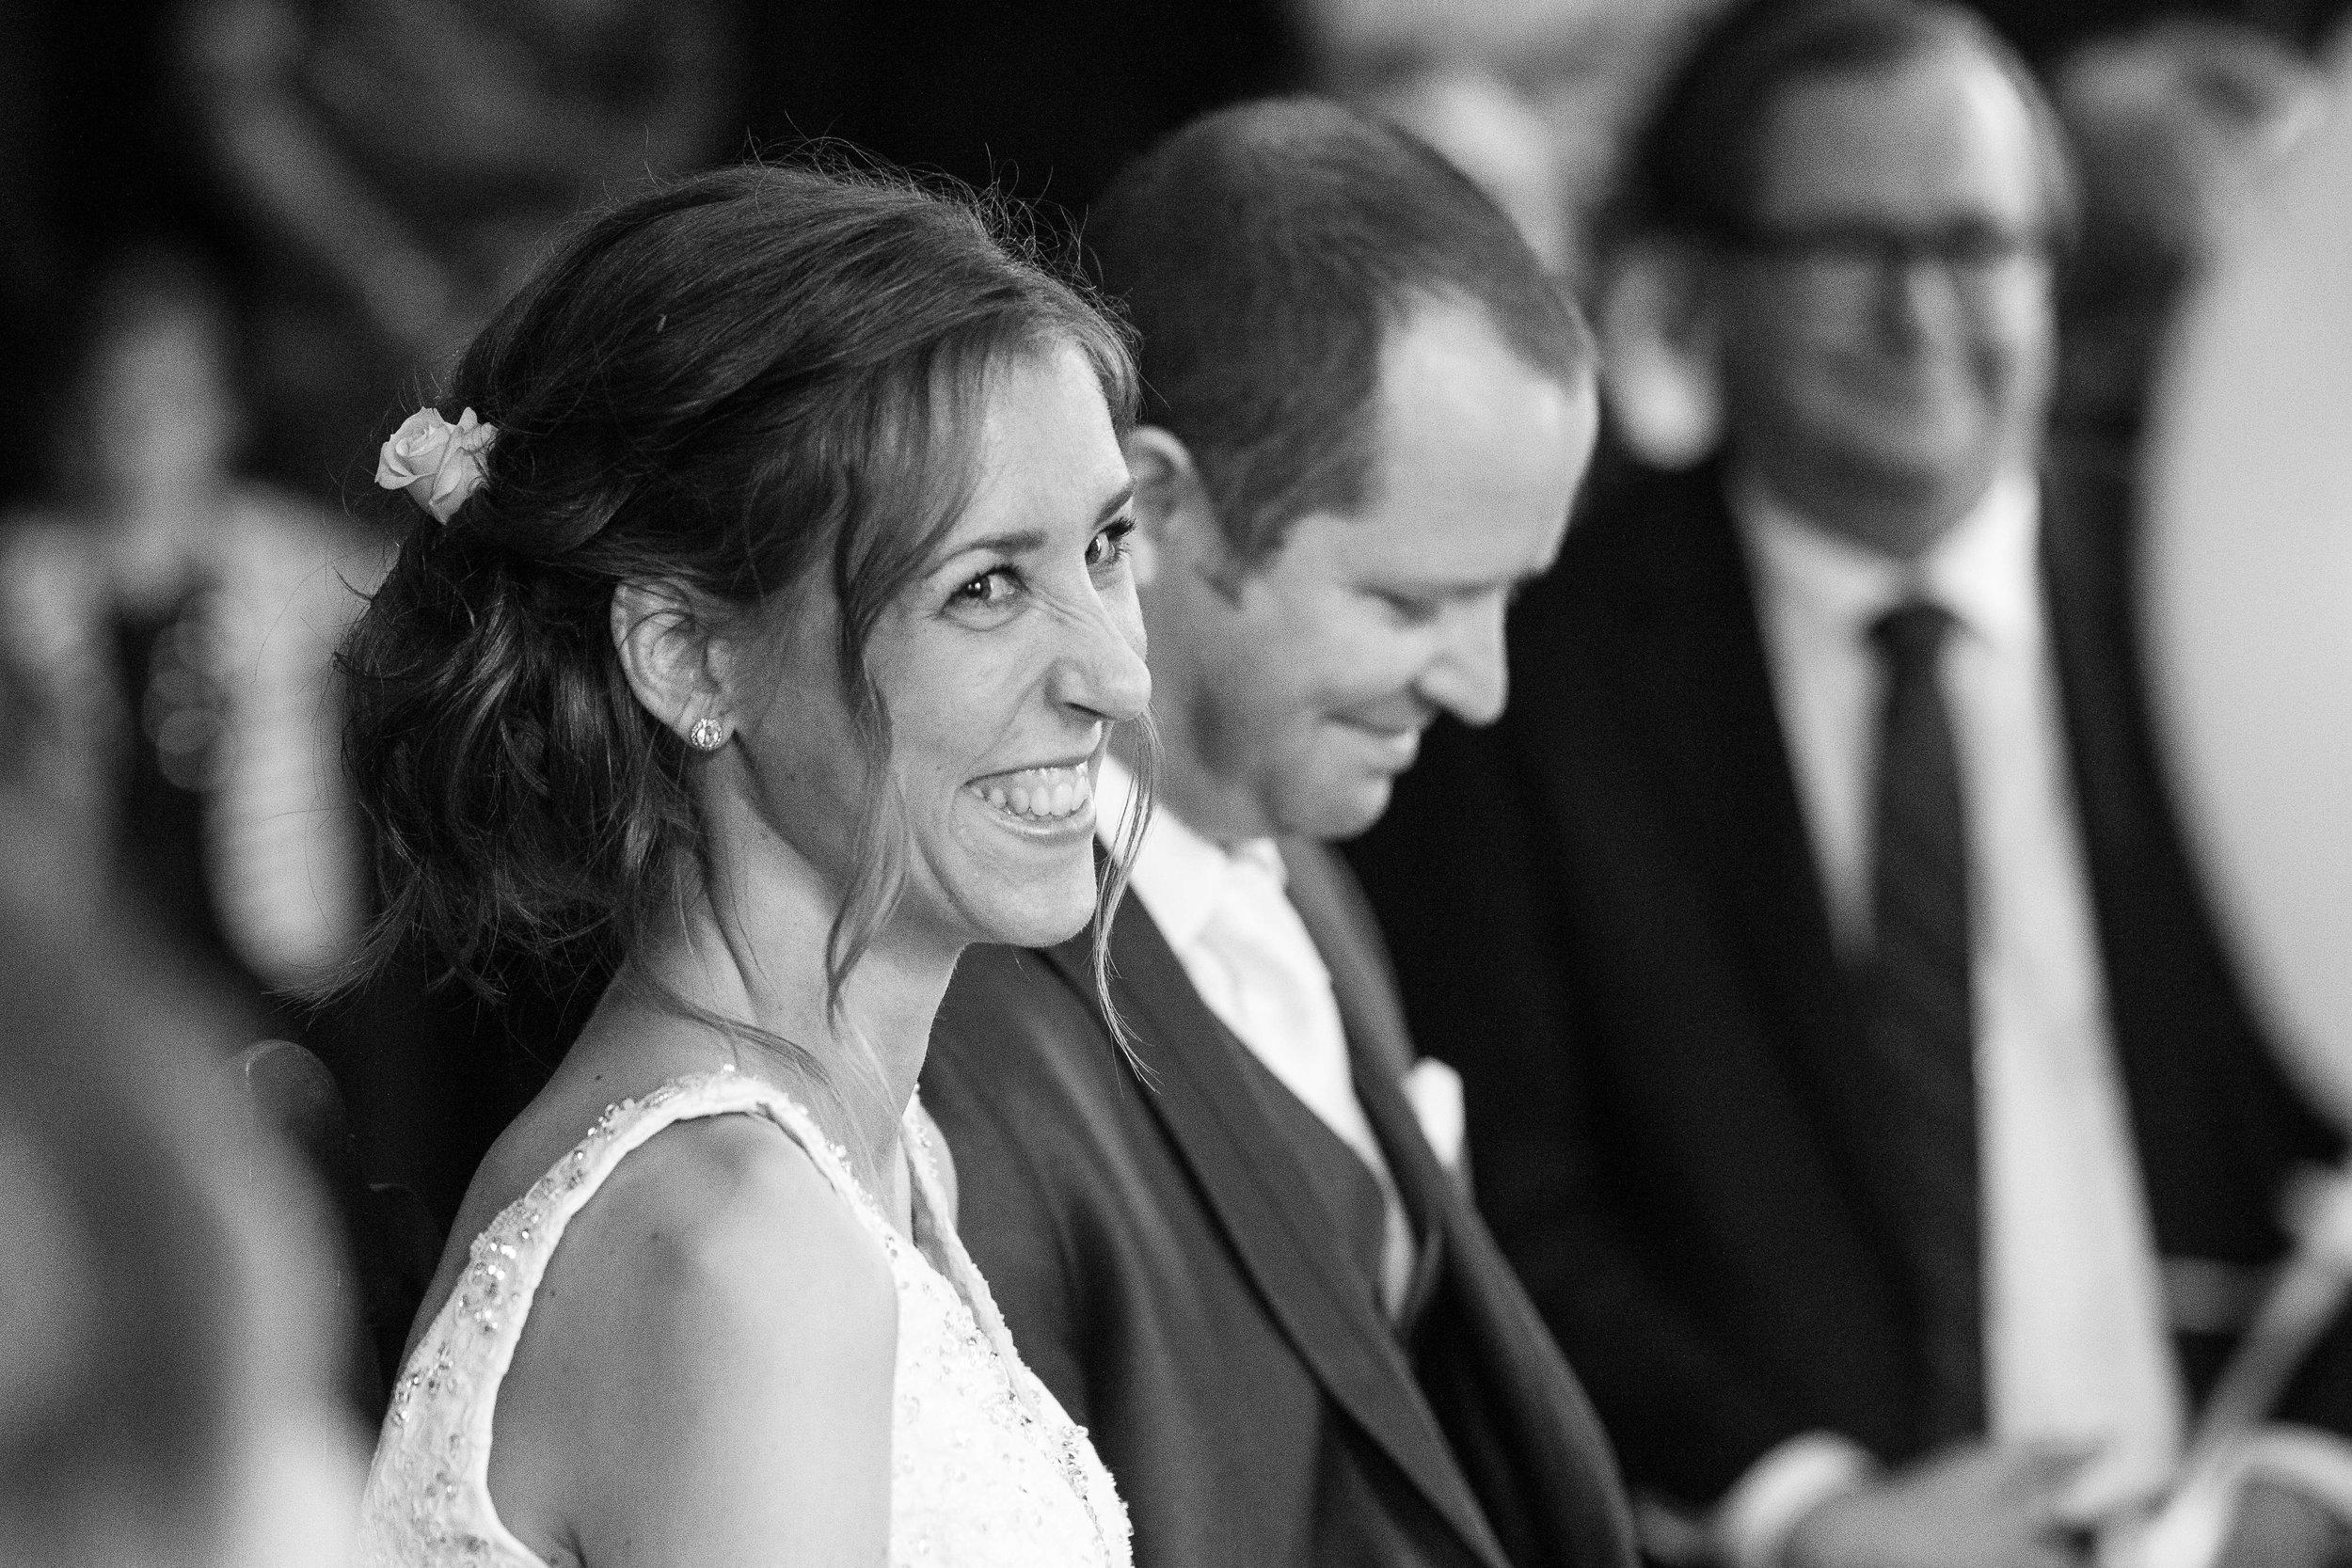 bruidsfotografie-trouwreportage-huwelijksfotografie-bruidsfotograaf-feestfotografie-Elise en Maarten-137.jpg